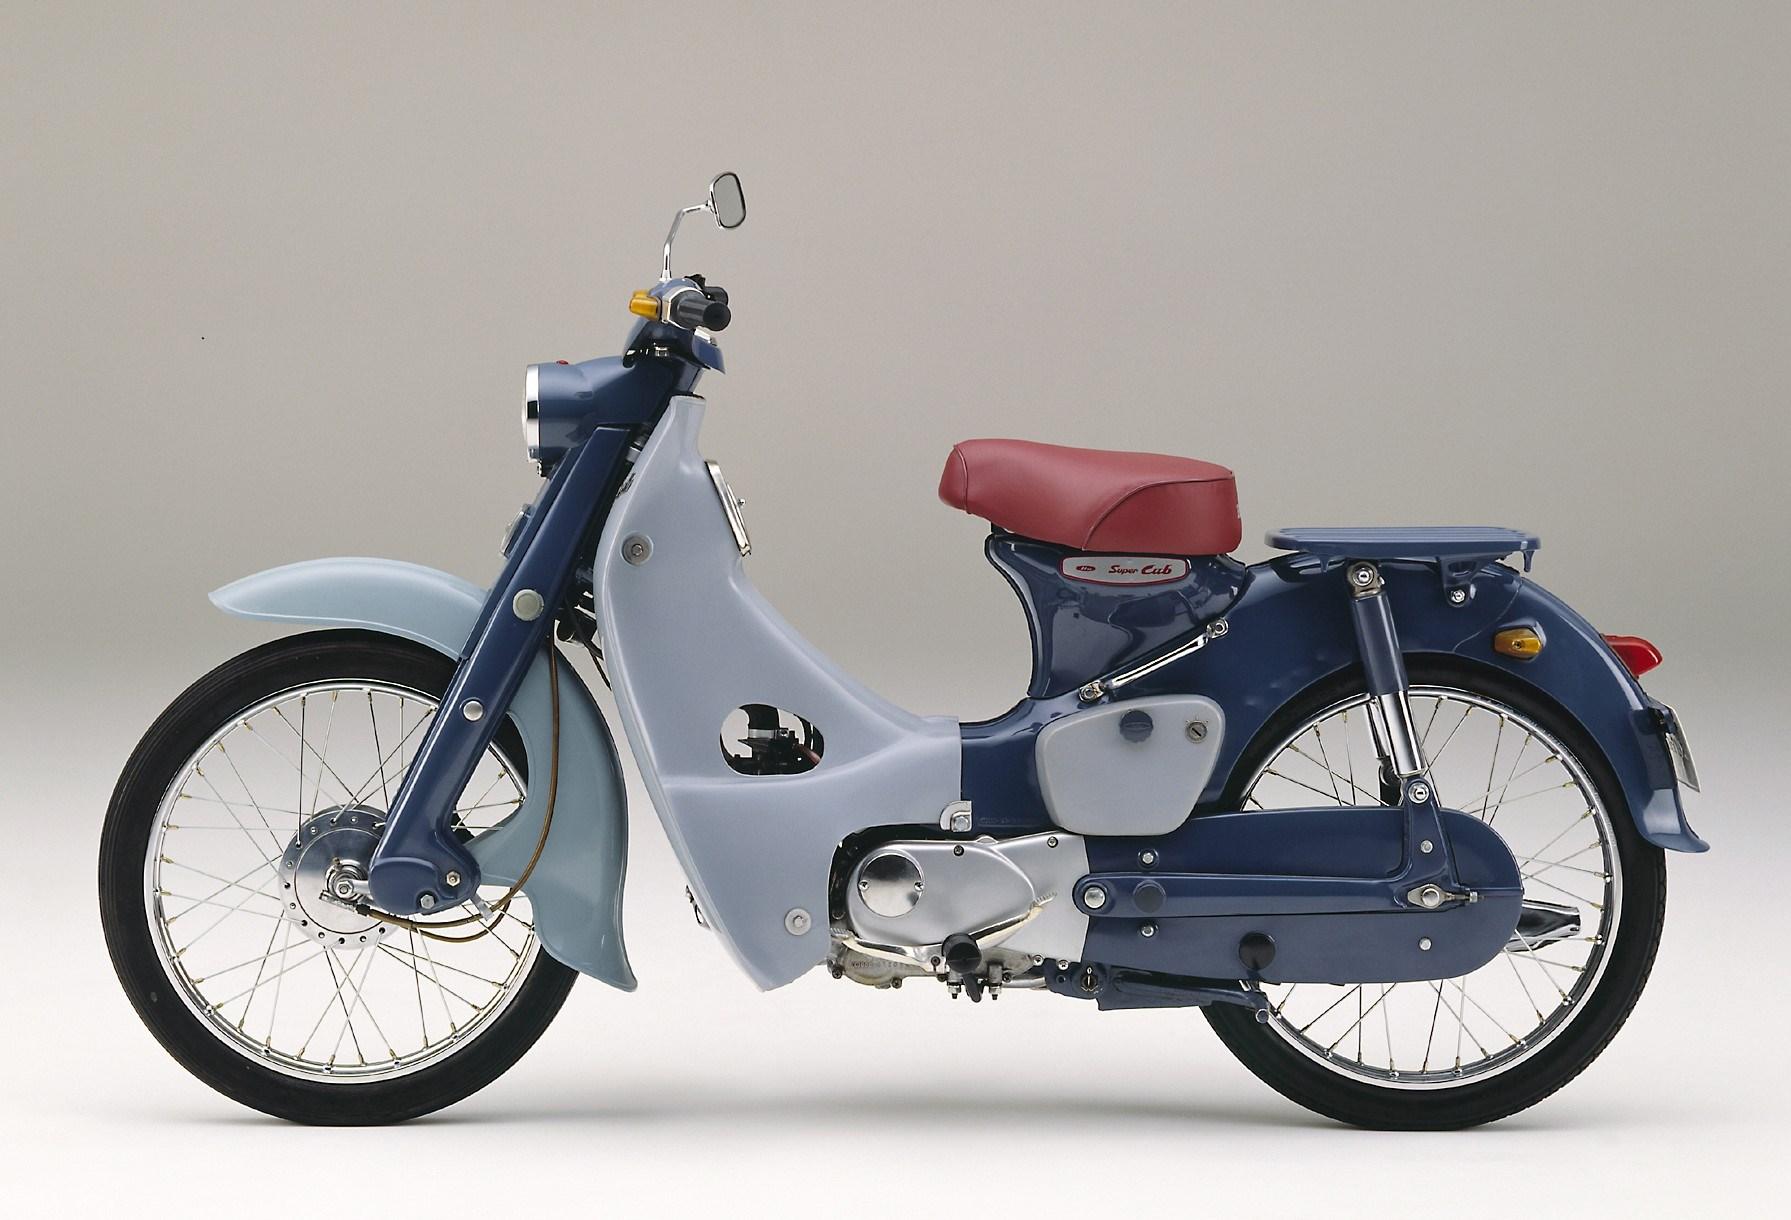 honda super cub c125 classic motorbikes. Black Bedroom Furniture Sets. Home Design Ideas